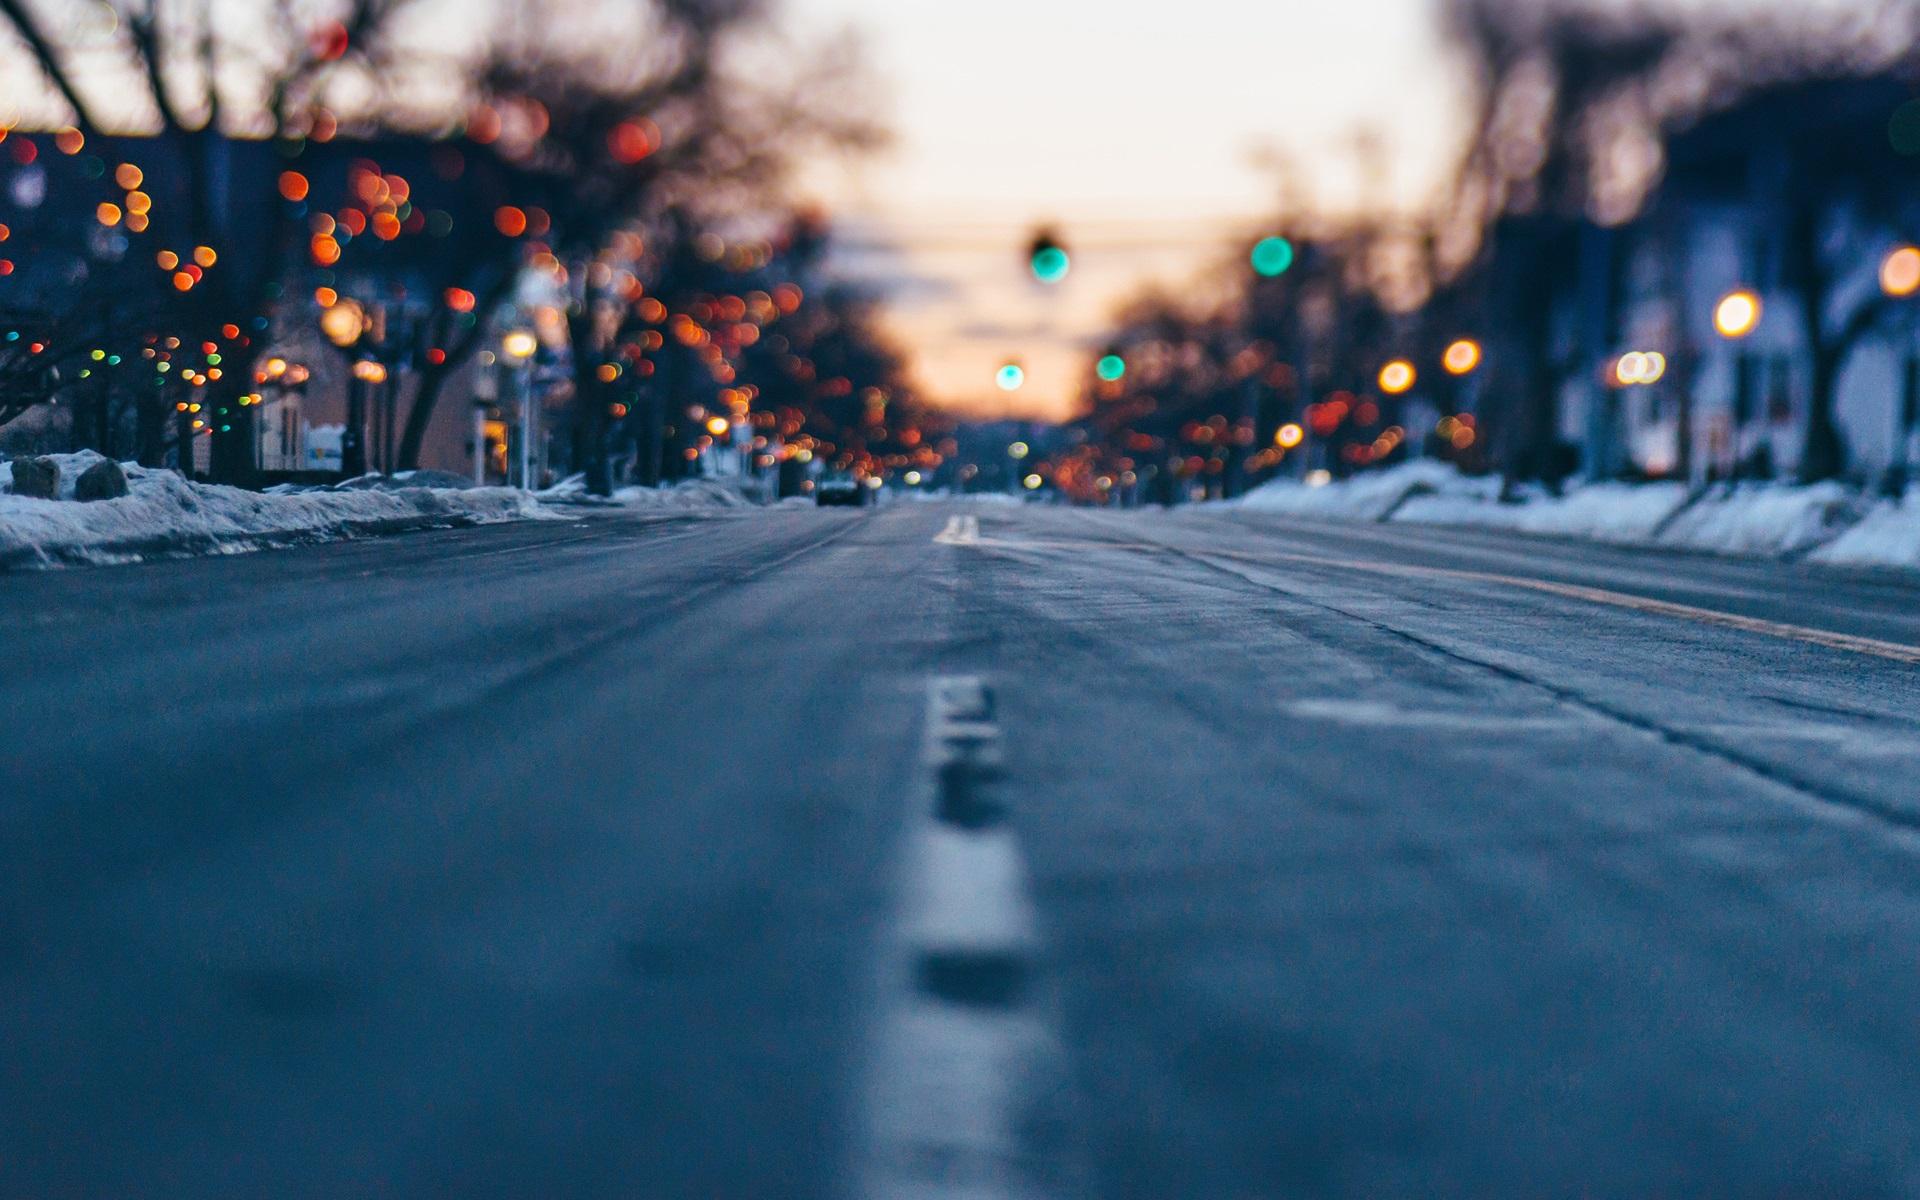 Wallpaper City Street Bokeh Winter Road Lights 1920x1200 HD